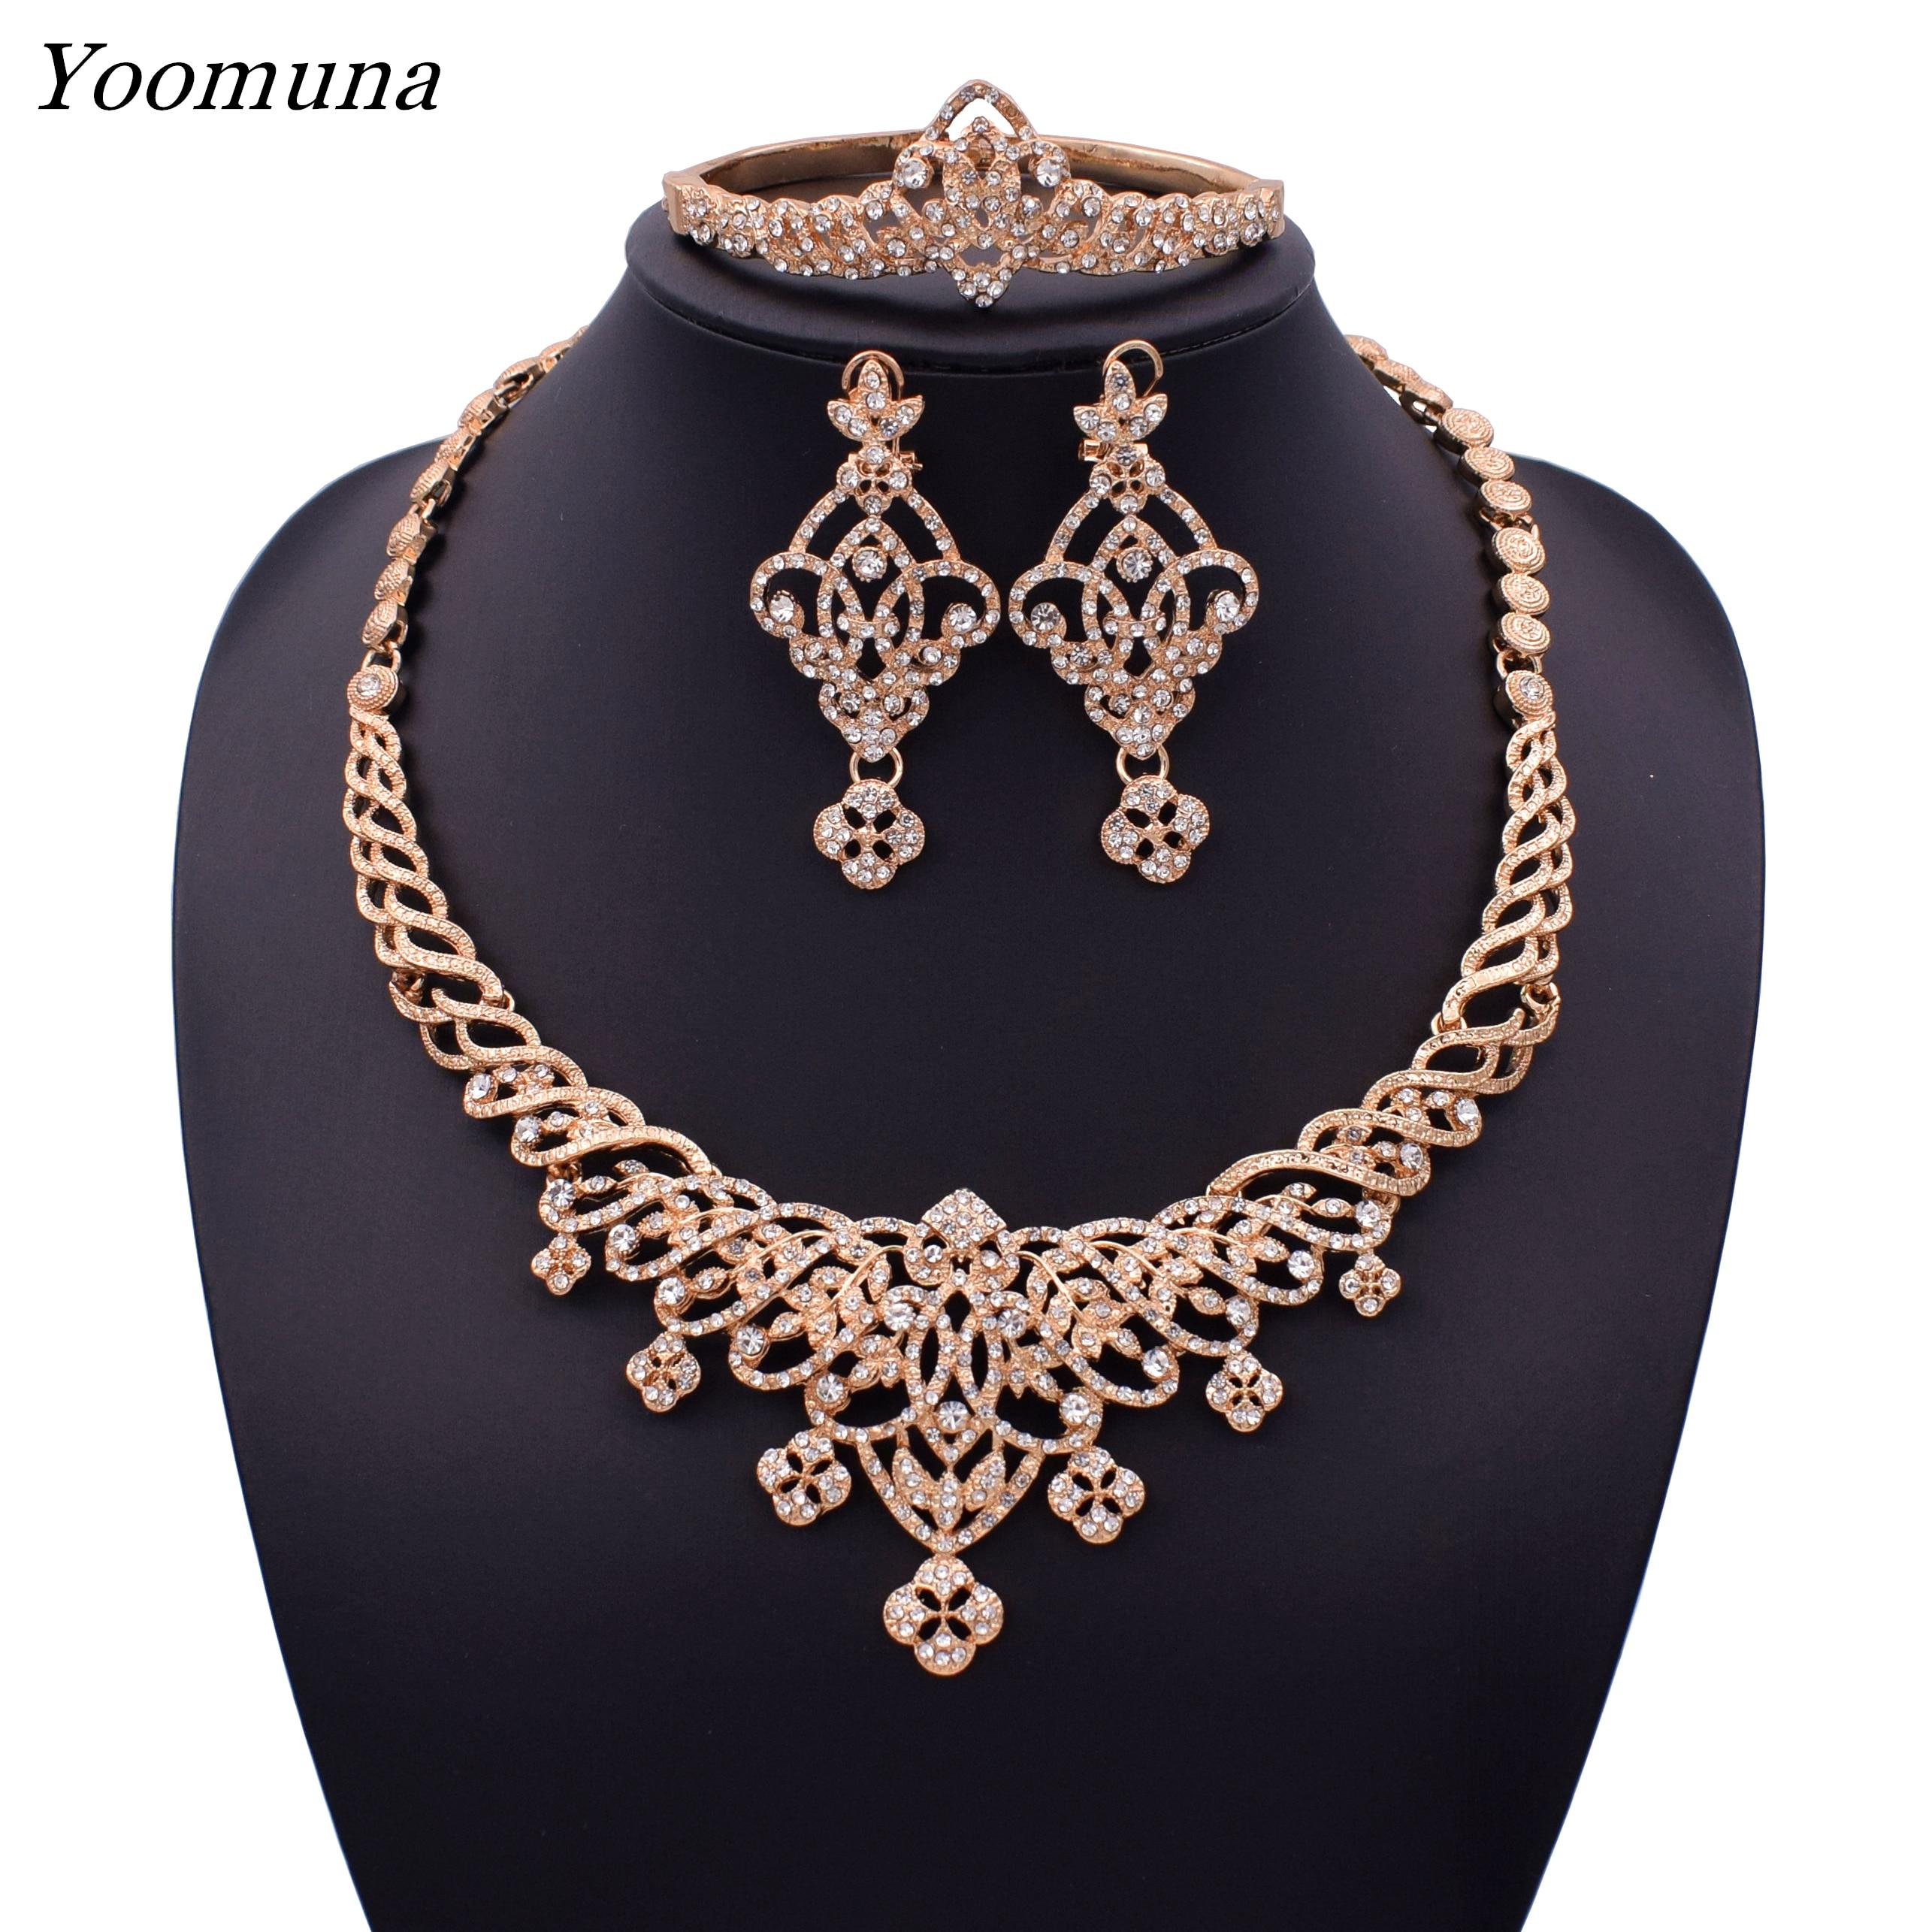 Elegant Dubai Rose Gold Jewelry Set Nigerian Wedding African Beads Crystal Bridal Jewellery Set Crystal Ethiopian Jewelry Parure Jewelry Sets Aliexpress